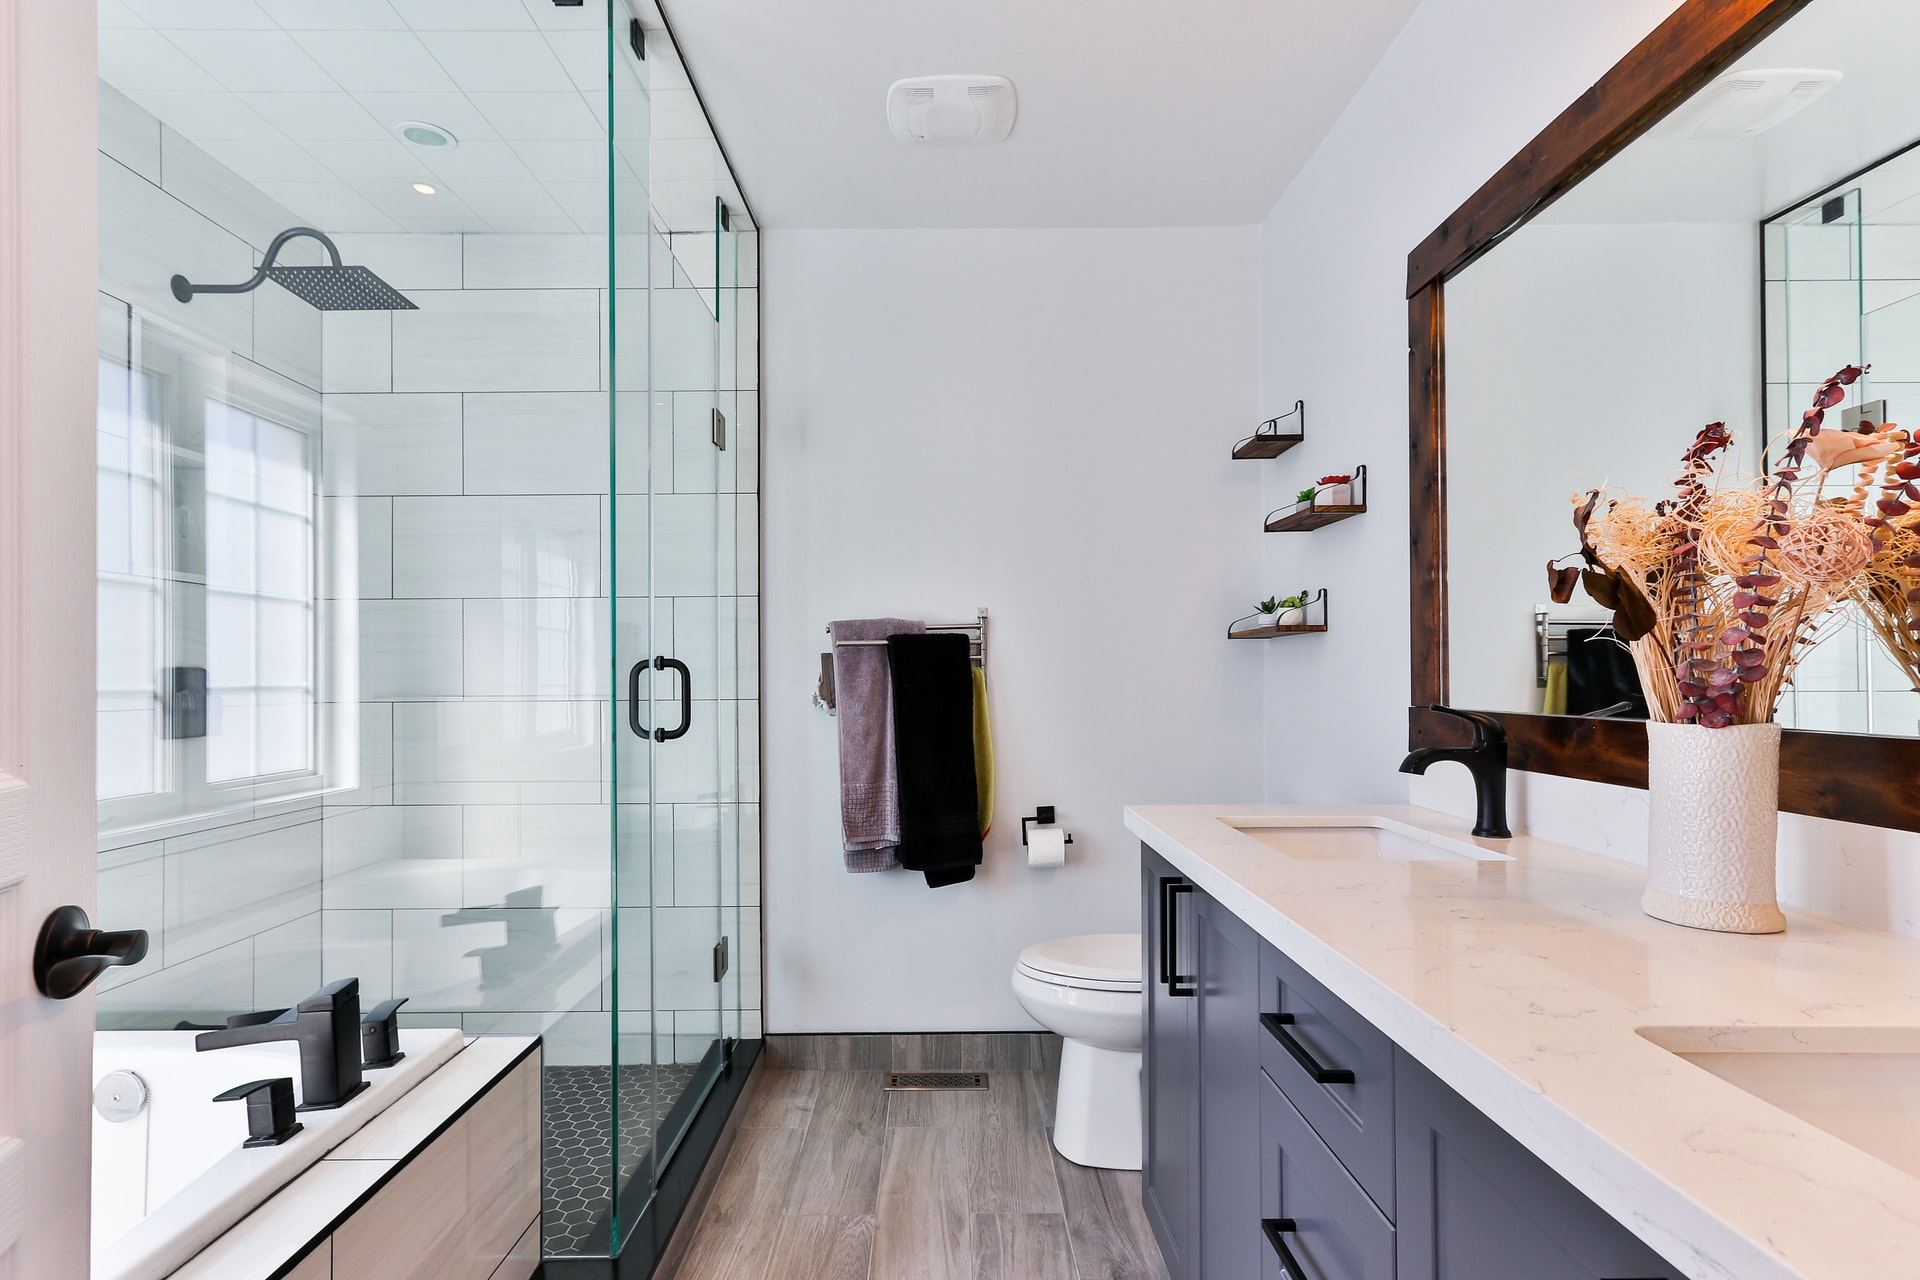 Trending Bathroom Designs for 2020